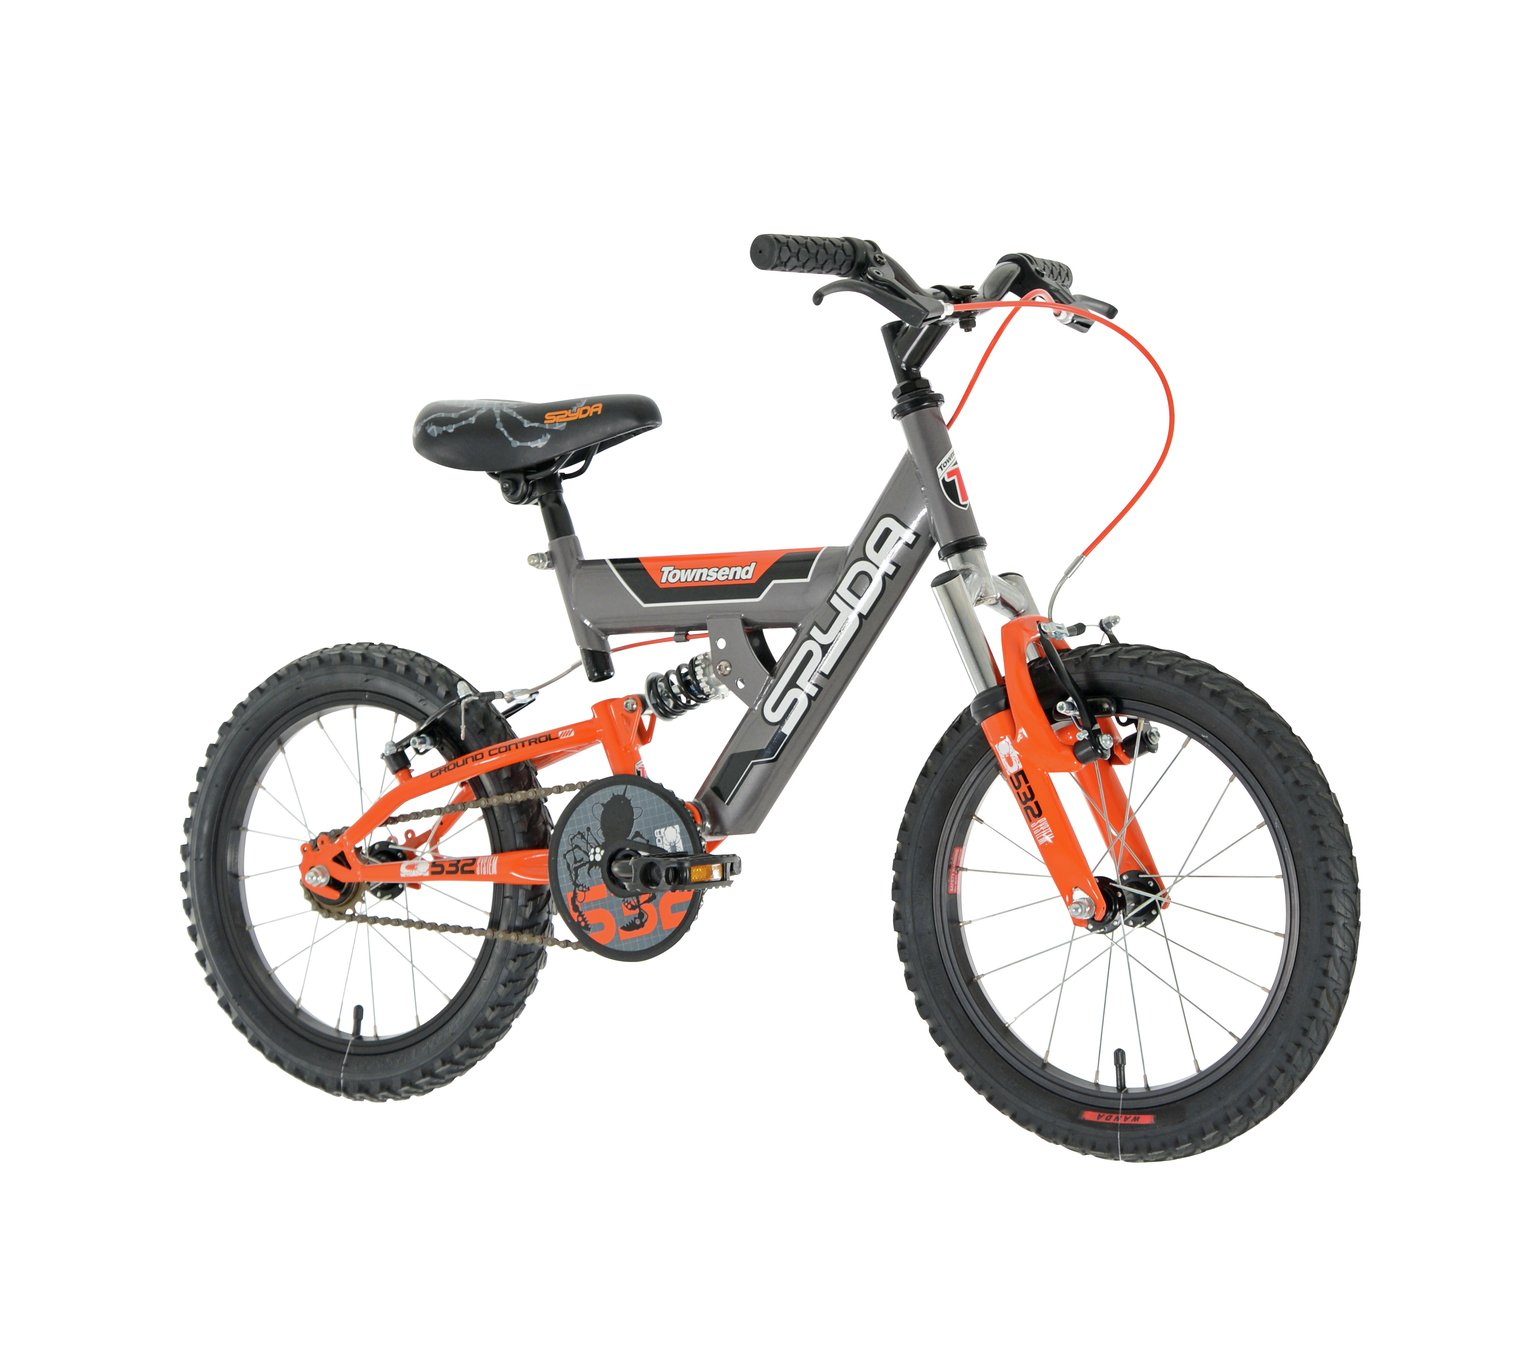 Townsend Spyda 16 Inch Kids Bike